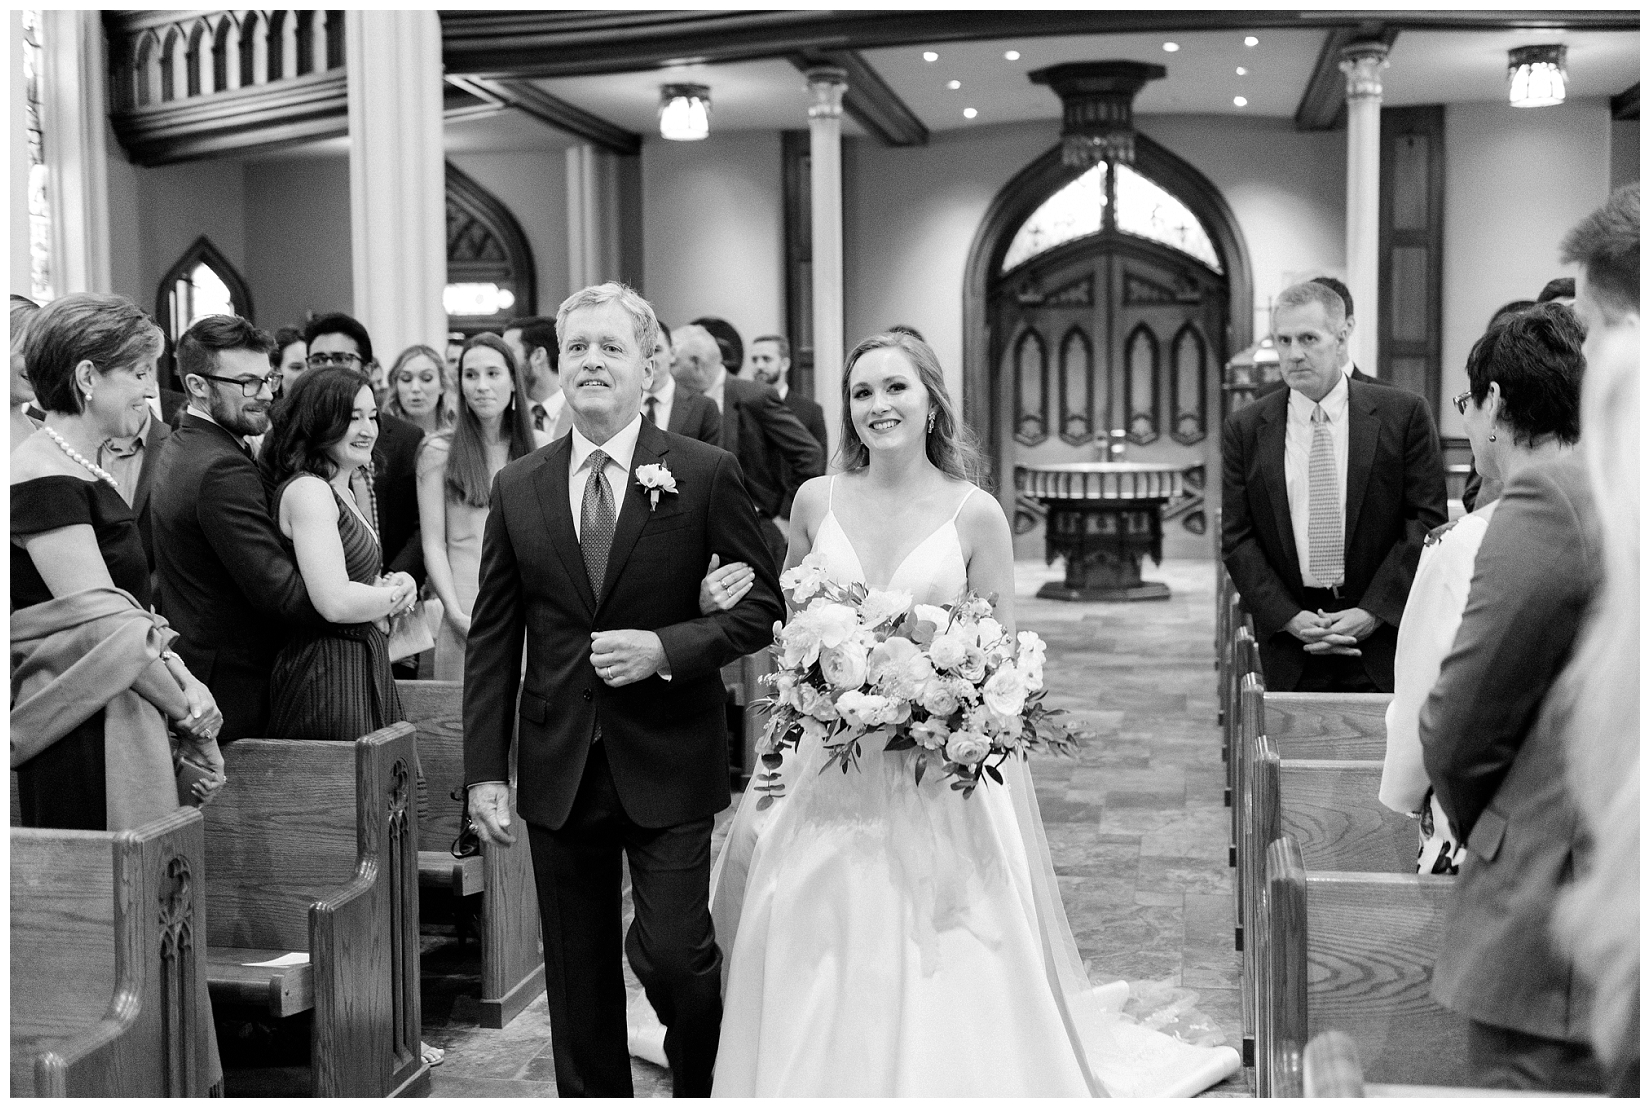 cat-alkire-wedding-photographer-indiana-chicago-indianapolis-fort-wayne_1193.jpg